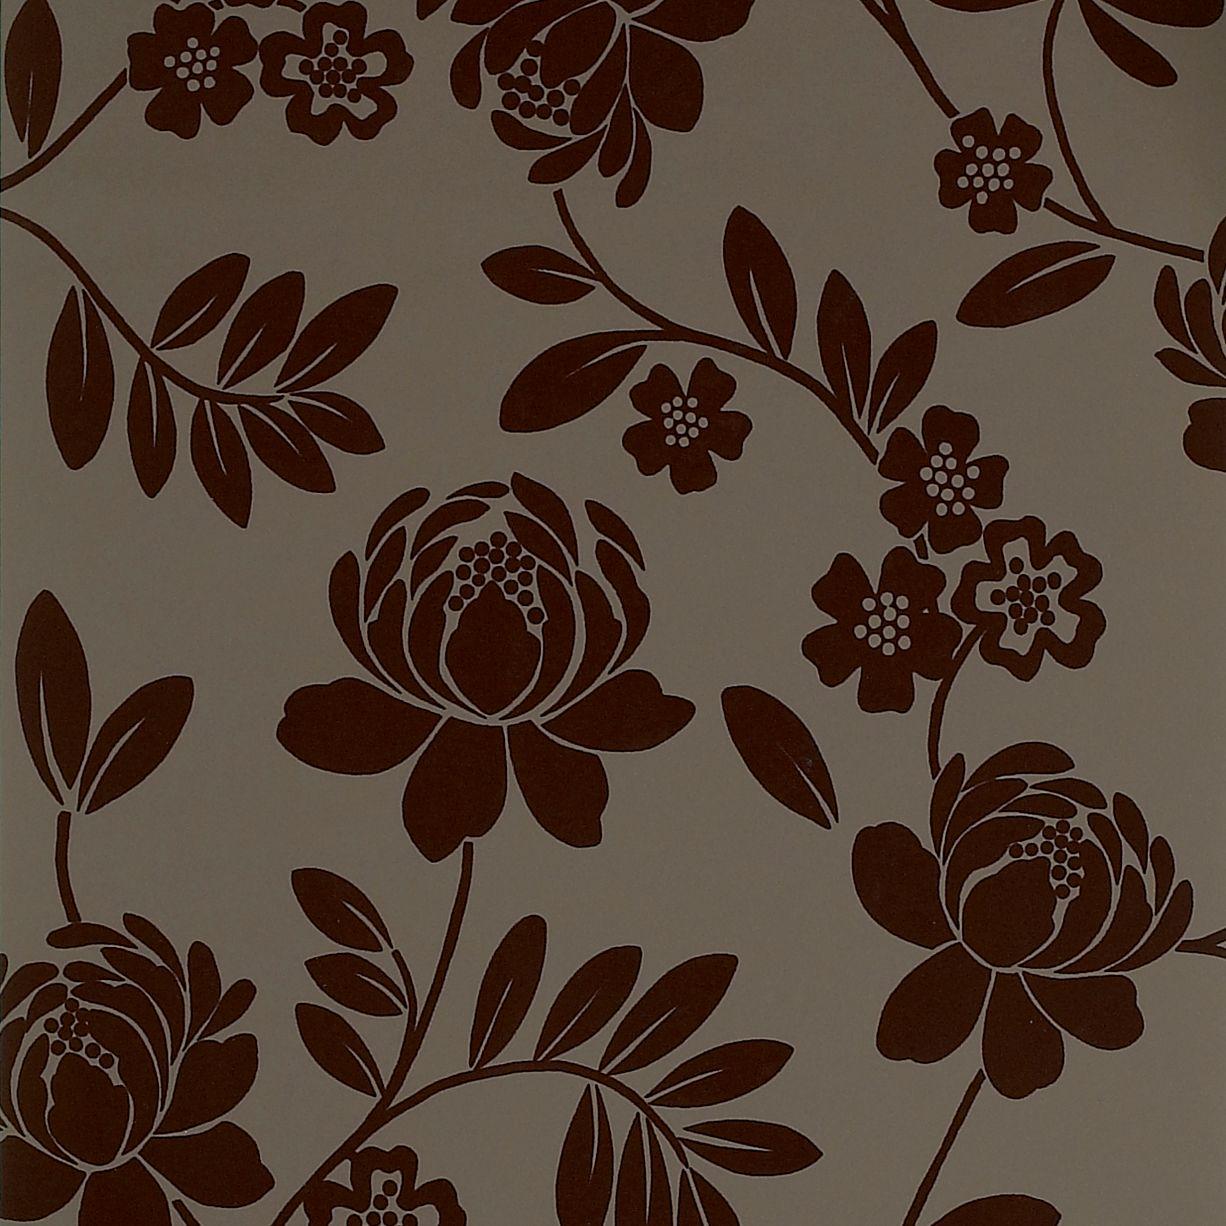 Brown Floral Wallpaper Sf Wallpaper